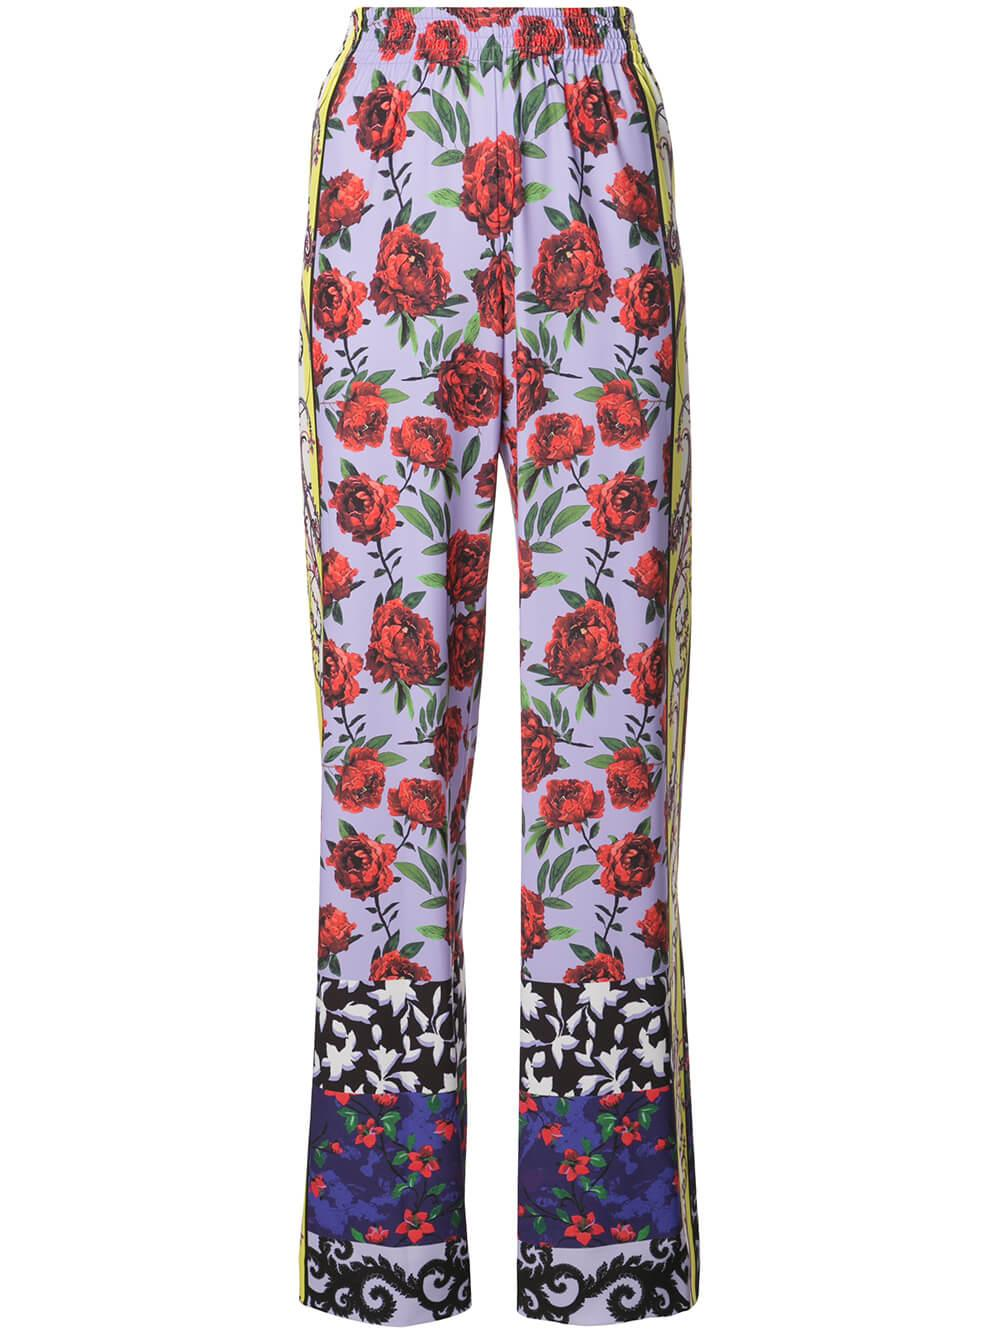 Elba Full Length Printed Wide Leg Pant